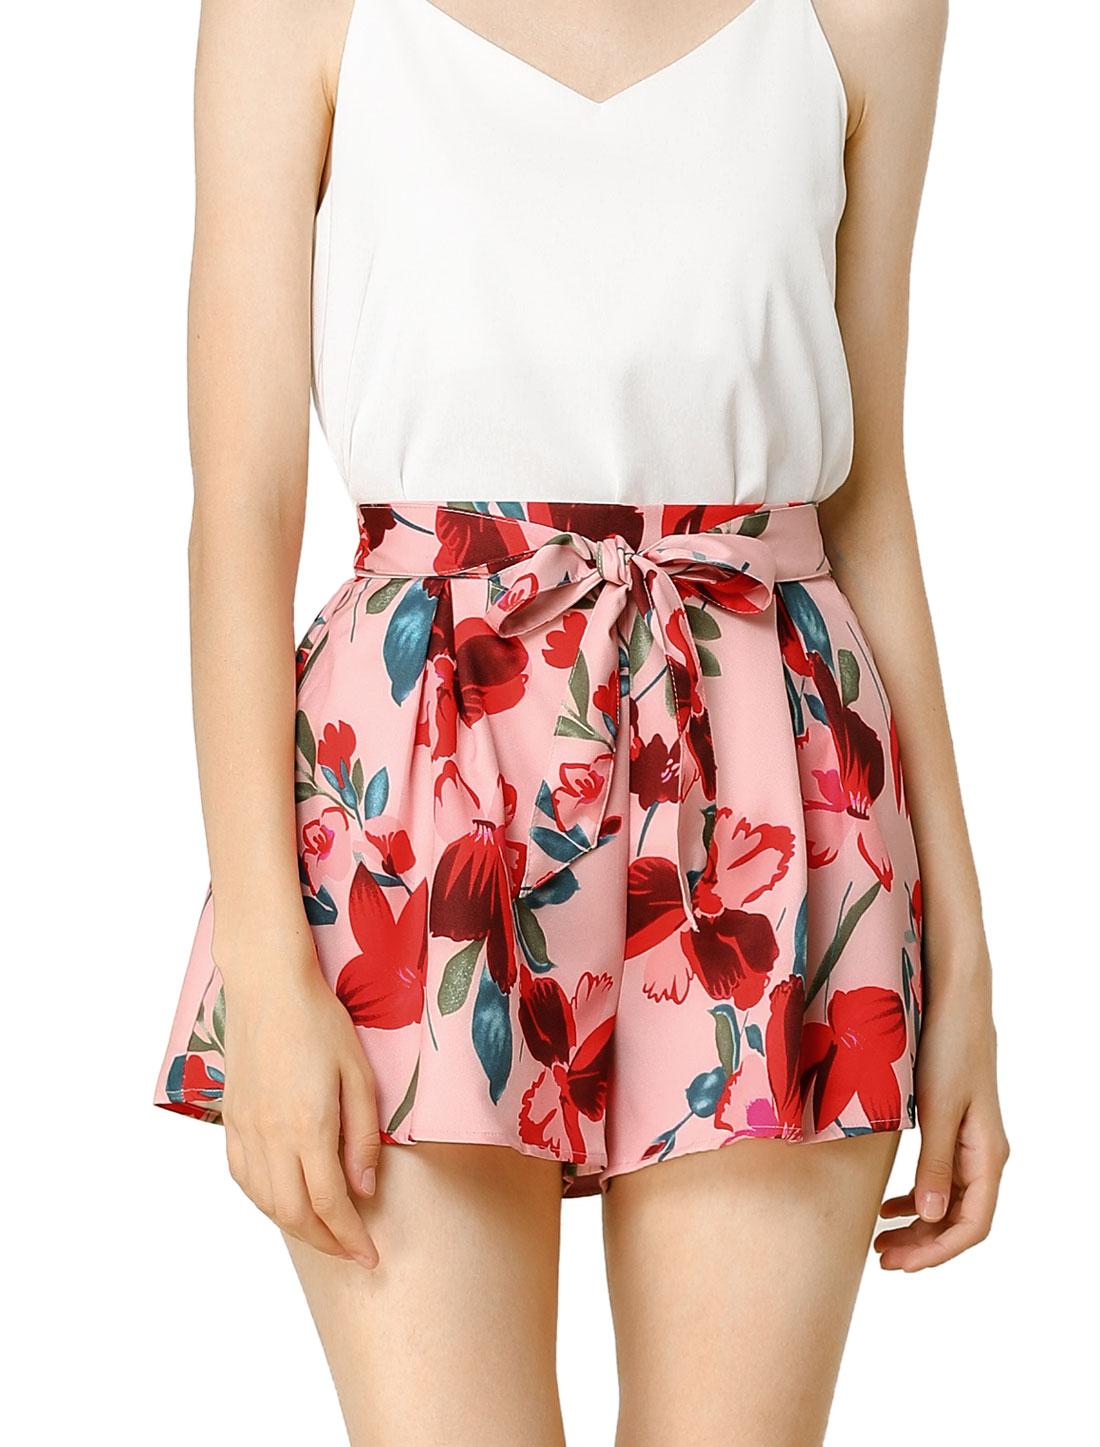 Women Elastic Waist Floral Print Summer Boho Beach Shorts Pink M